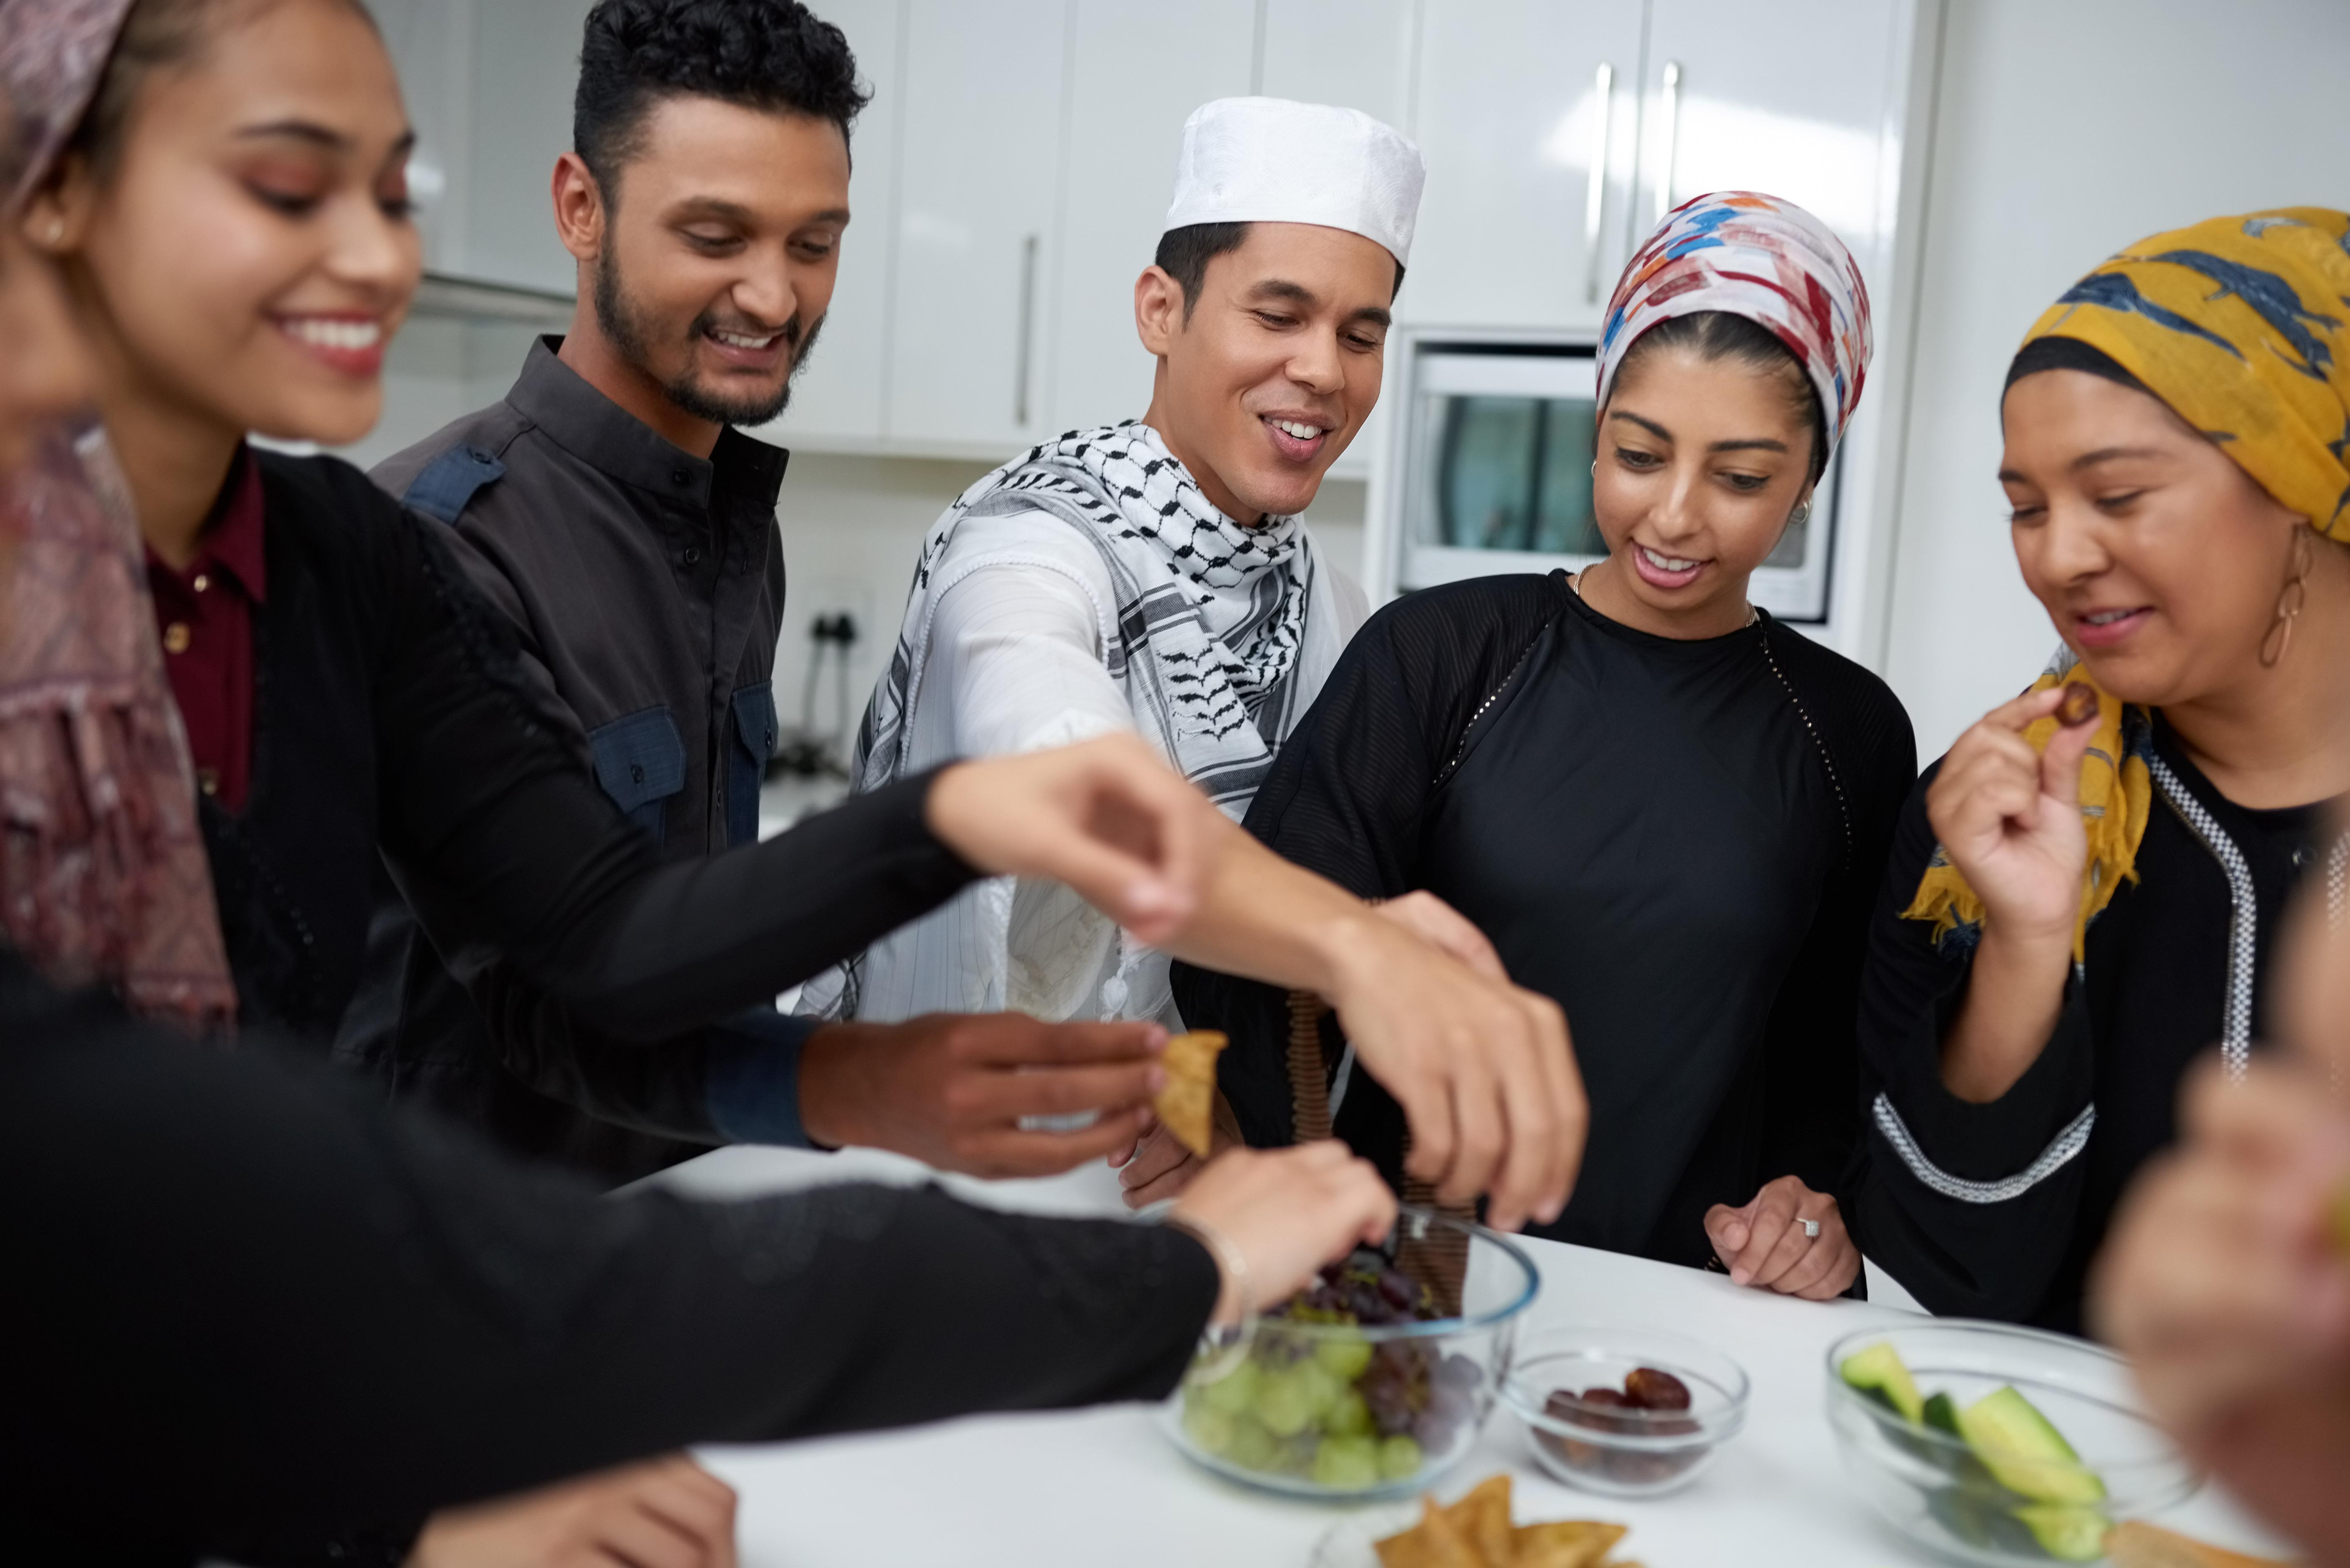 Free muslim dating sites uk Muslim dating